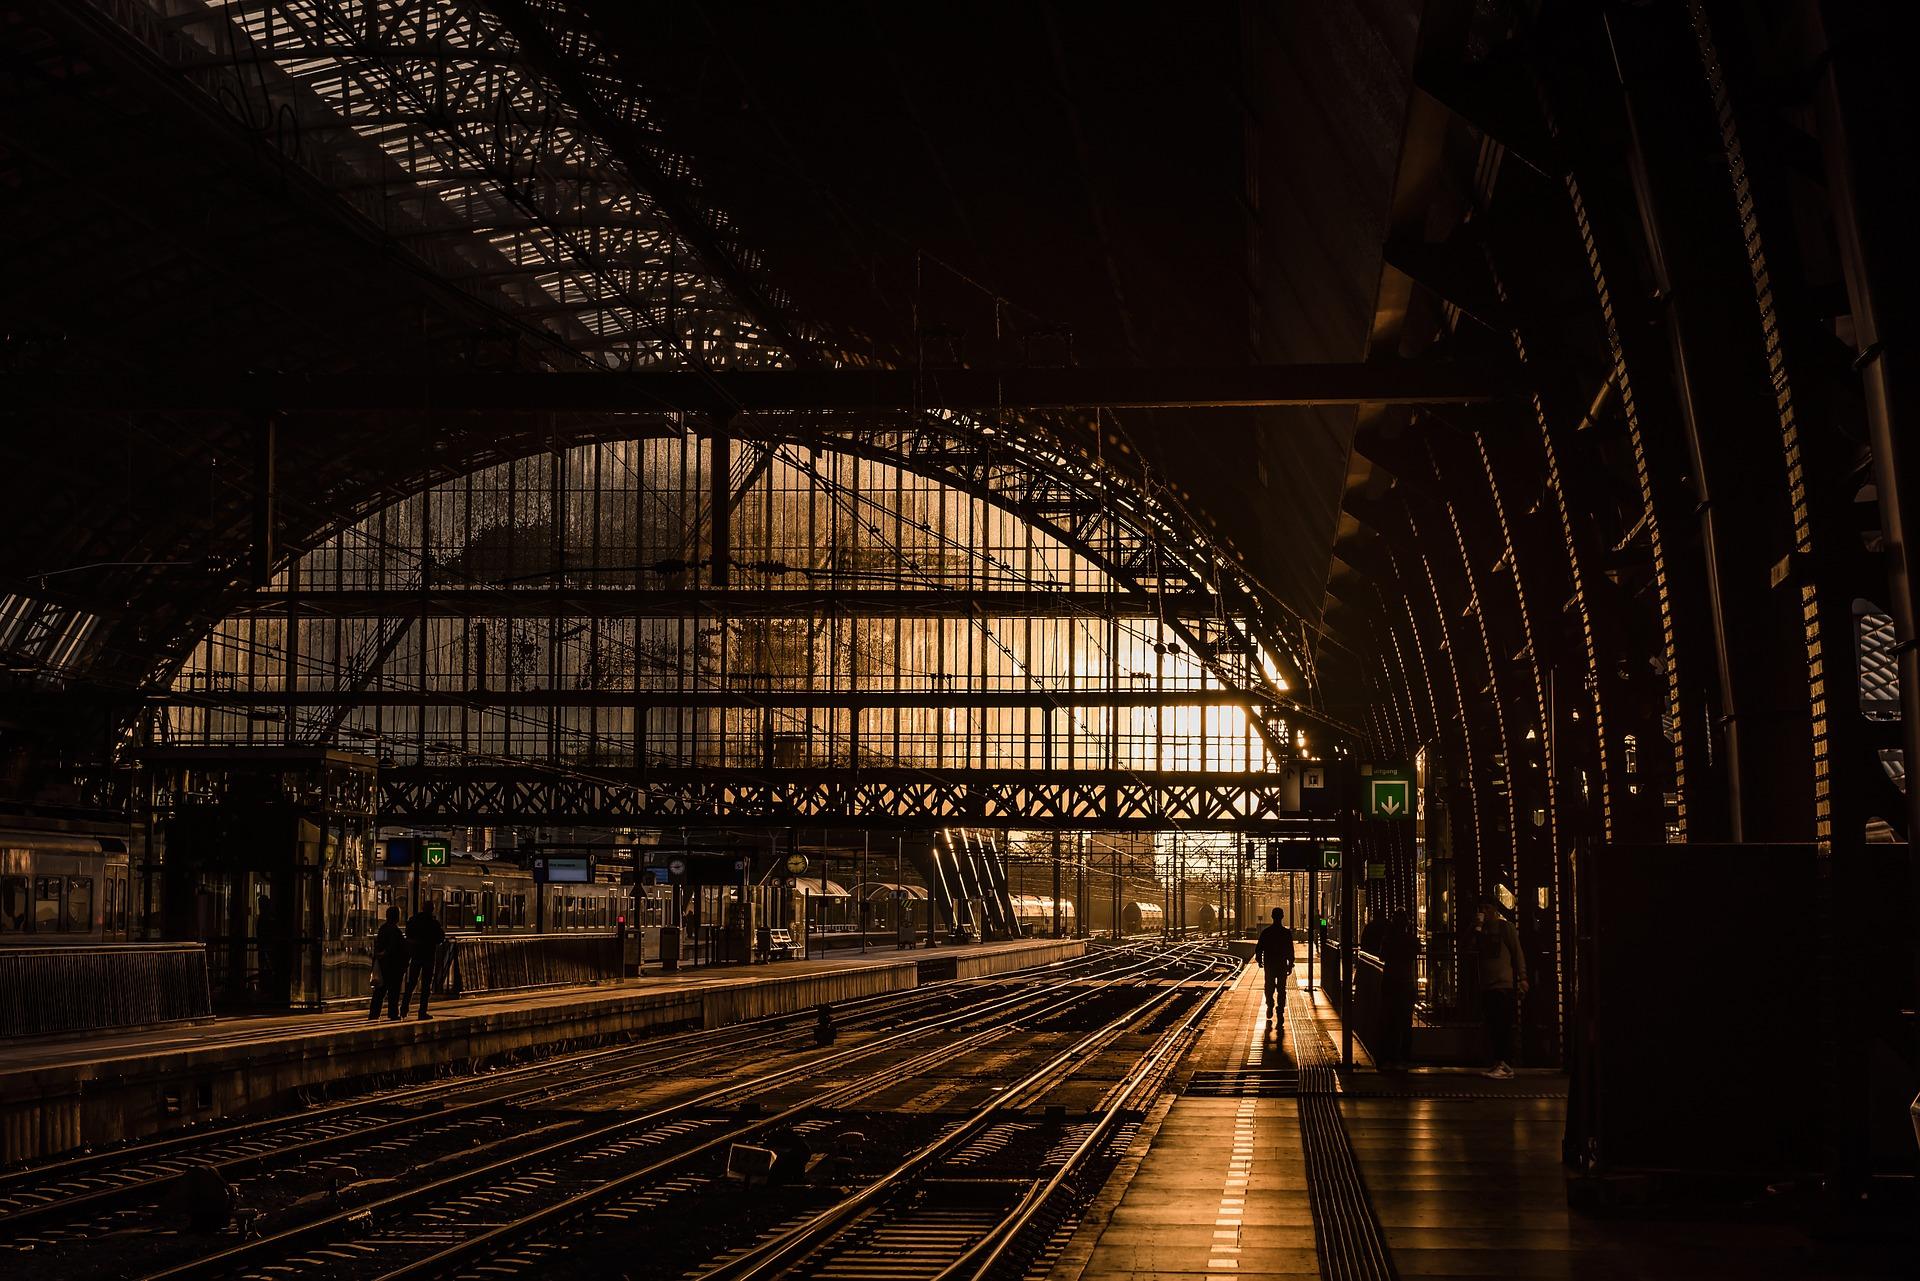 station-839208_1920